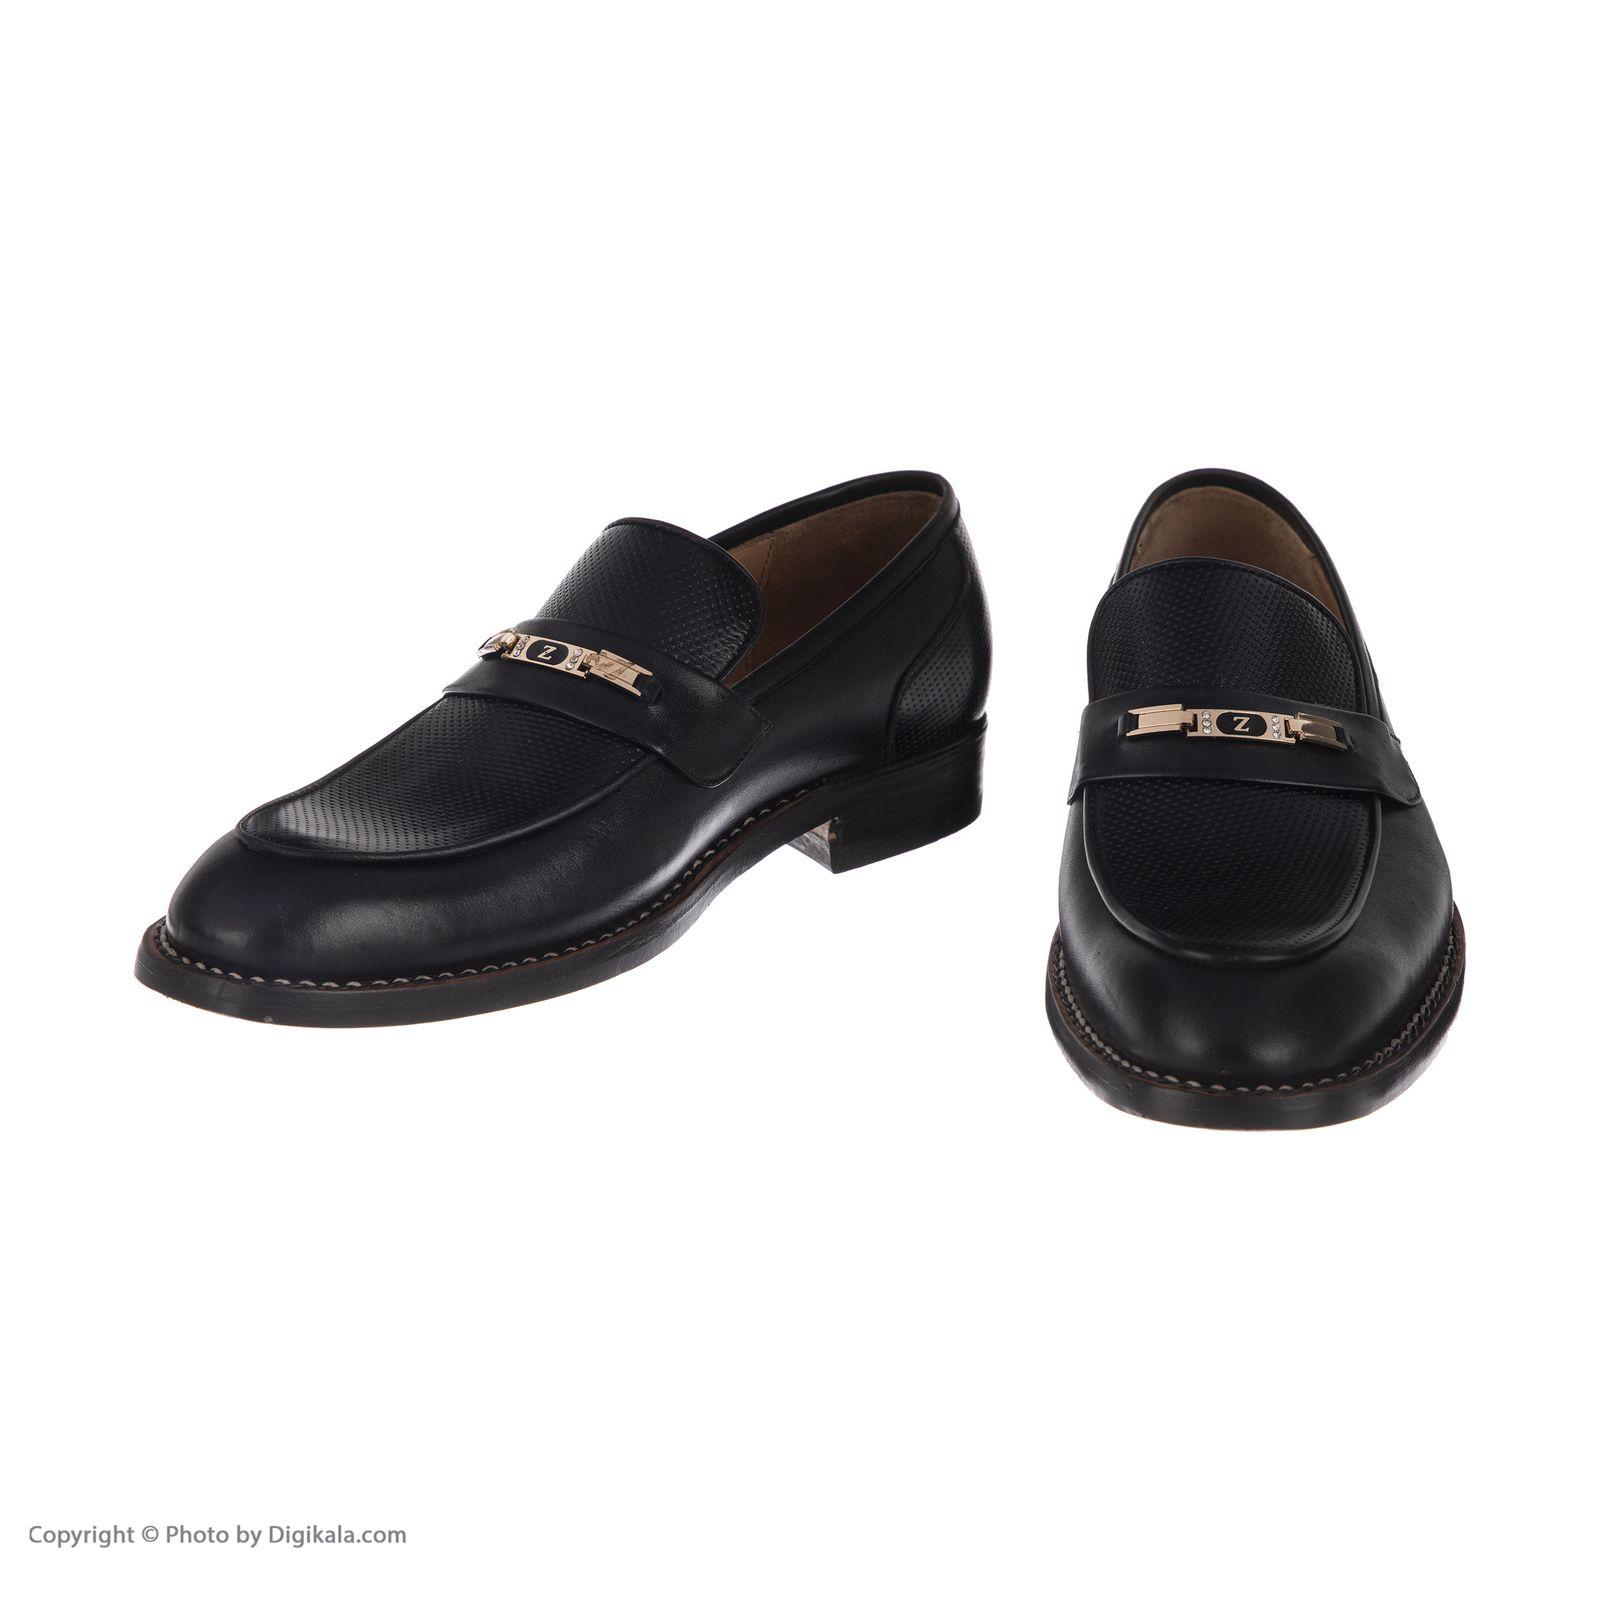 کفش مردانه نظری کد 403 -  - 4